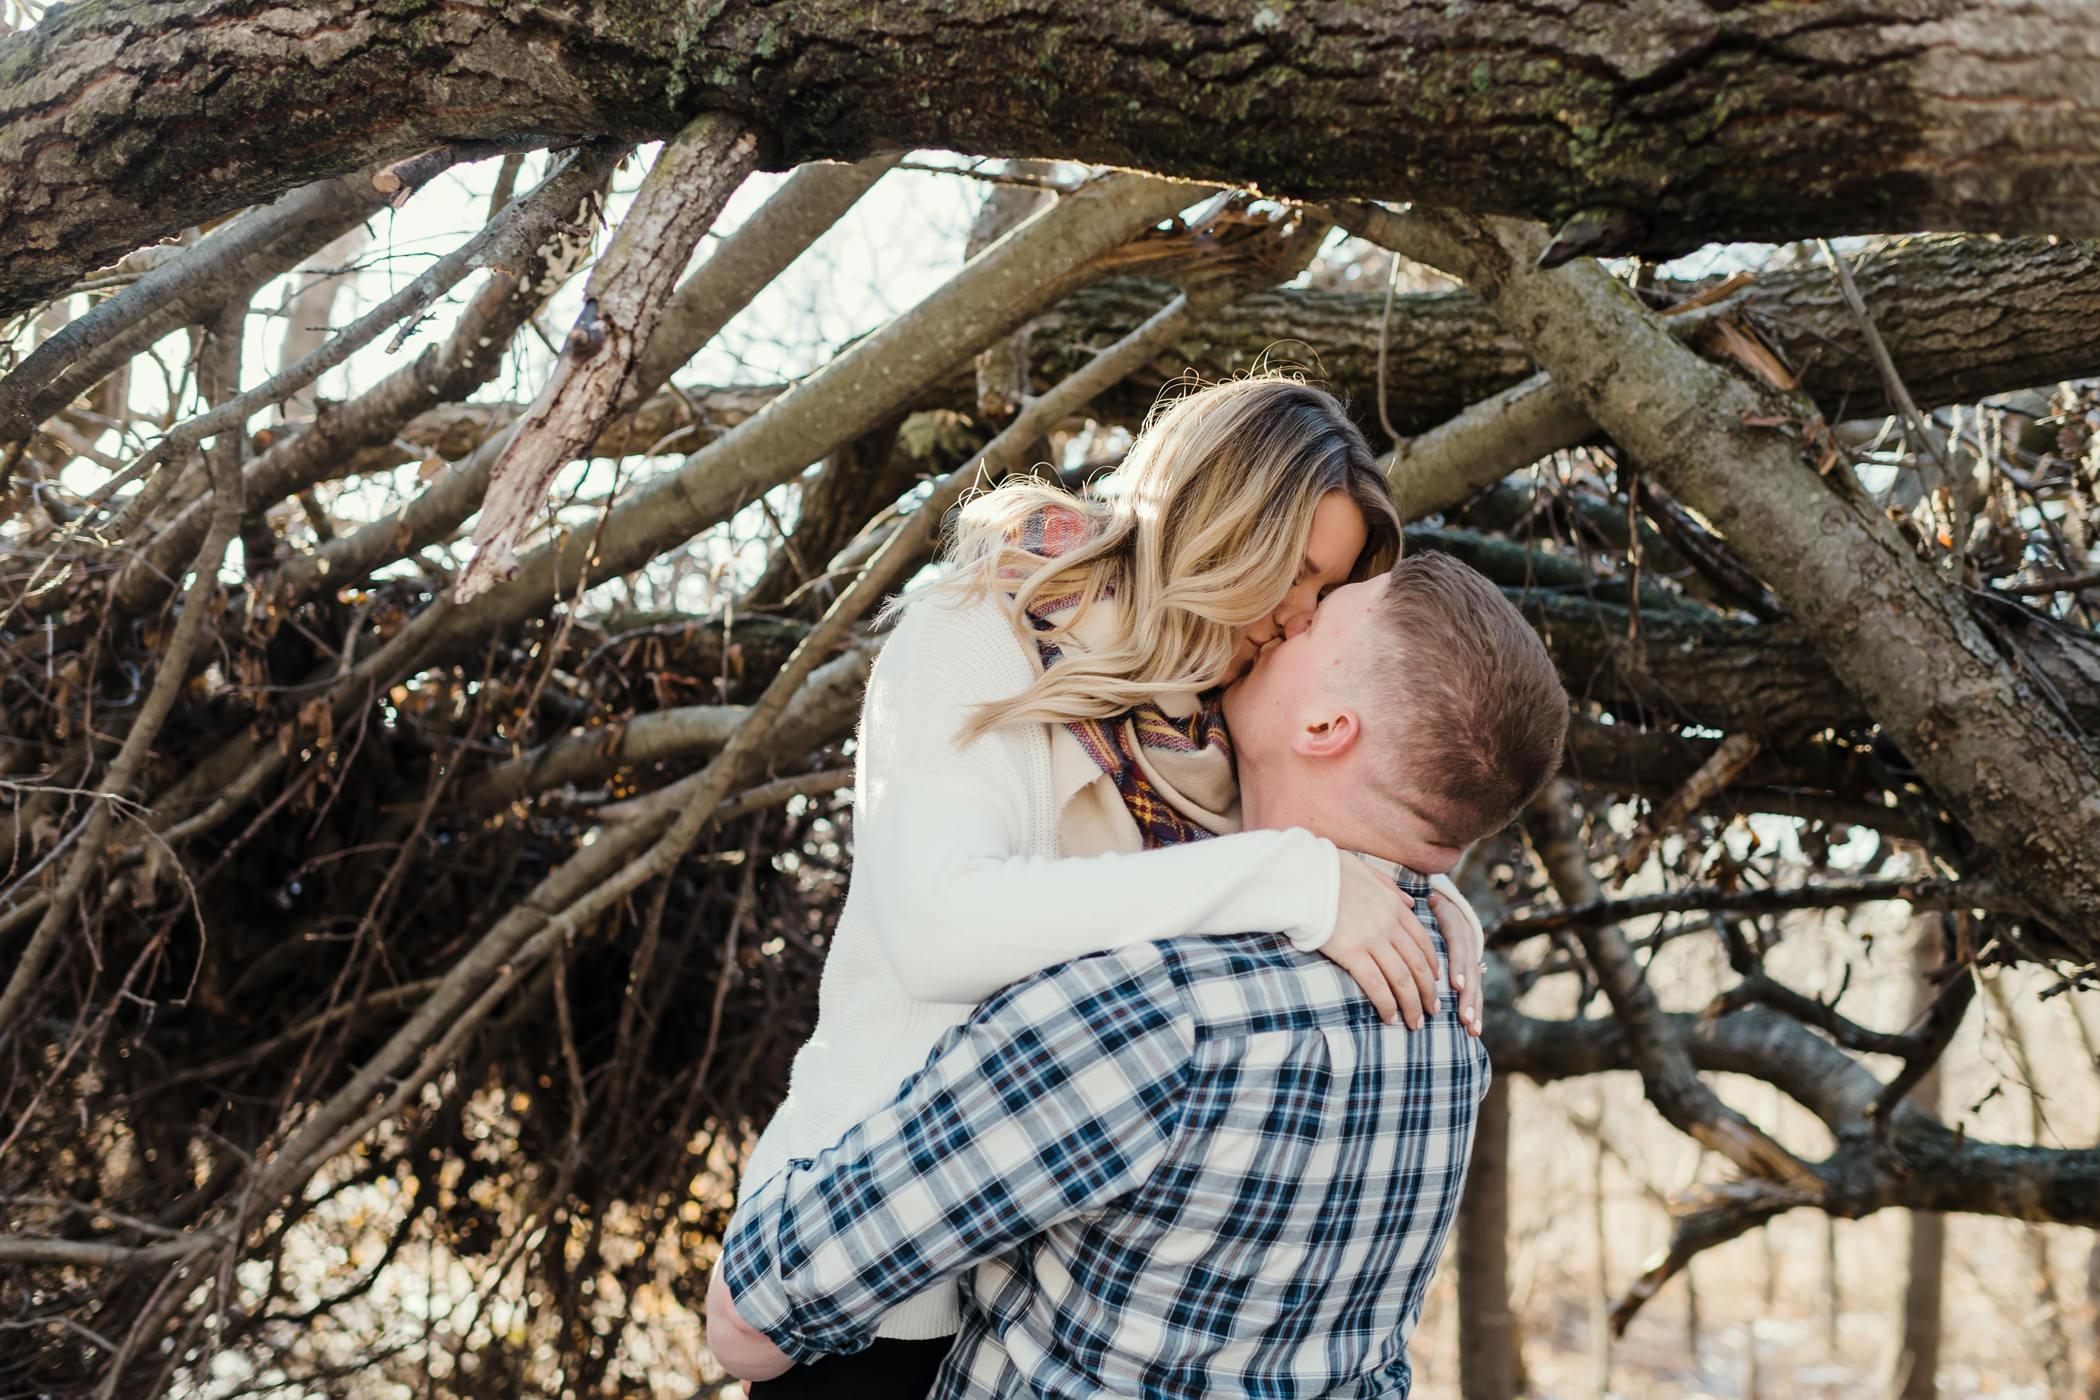 Man picks his fiancé up